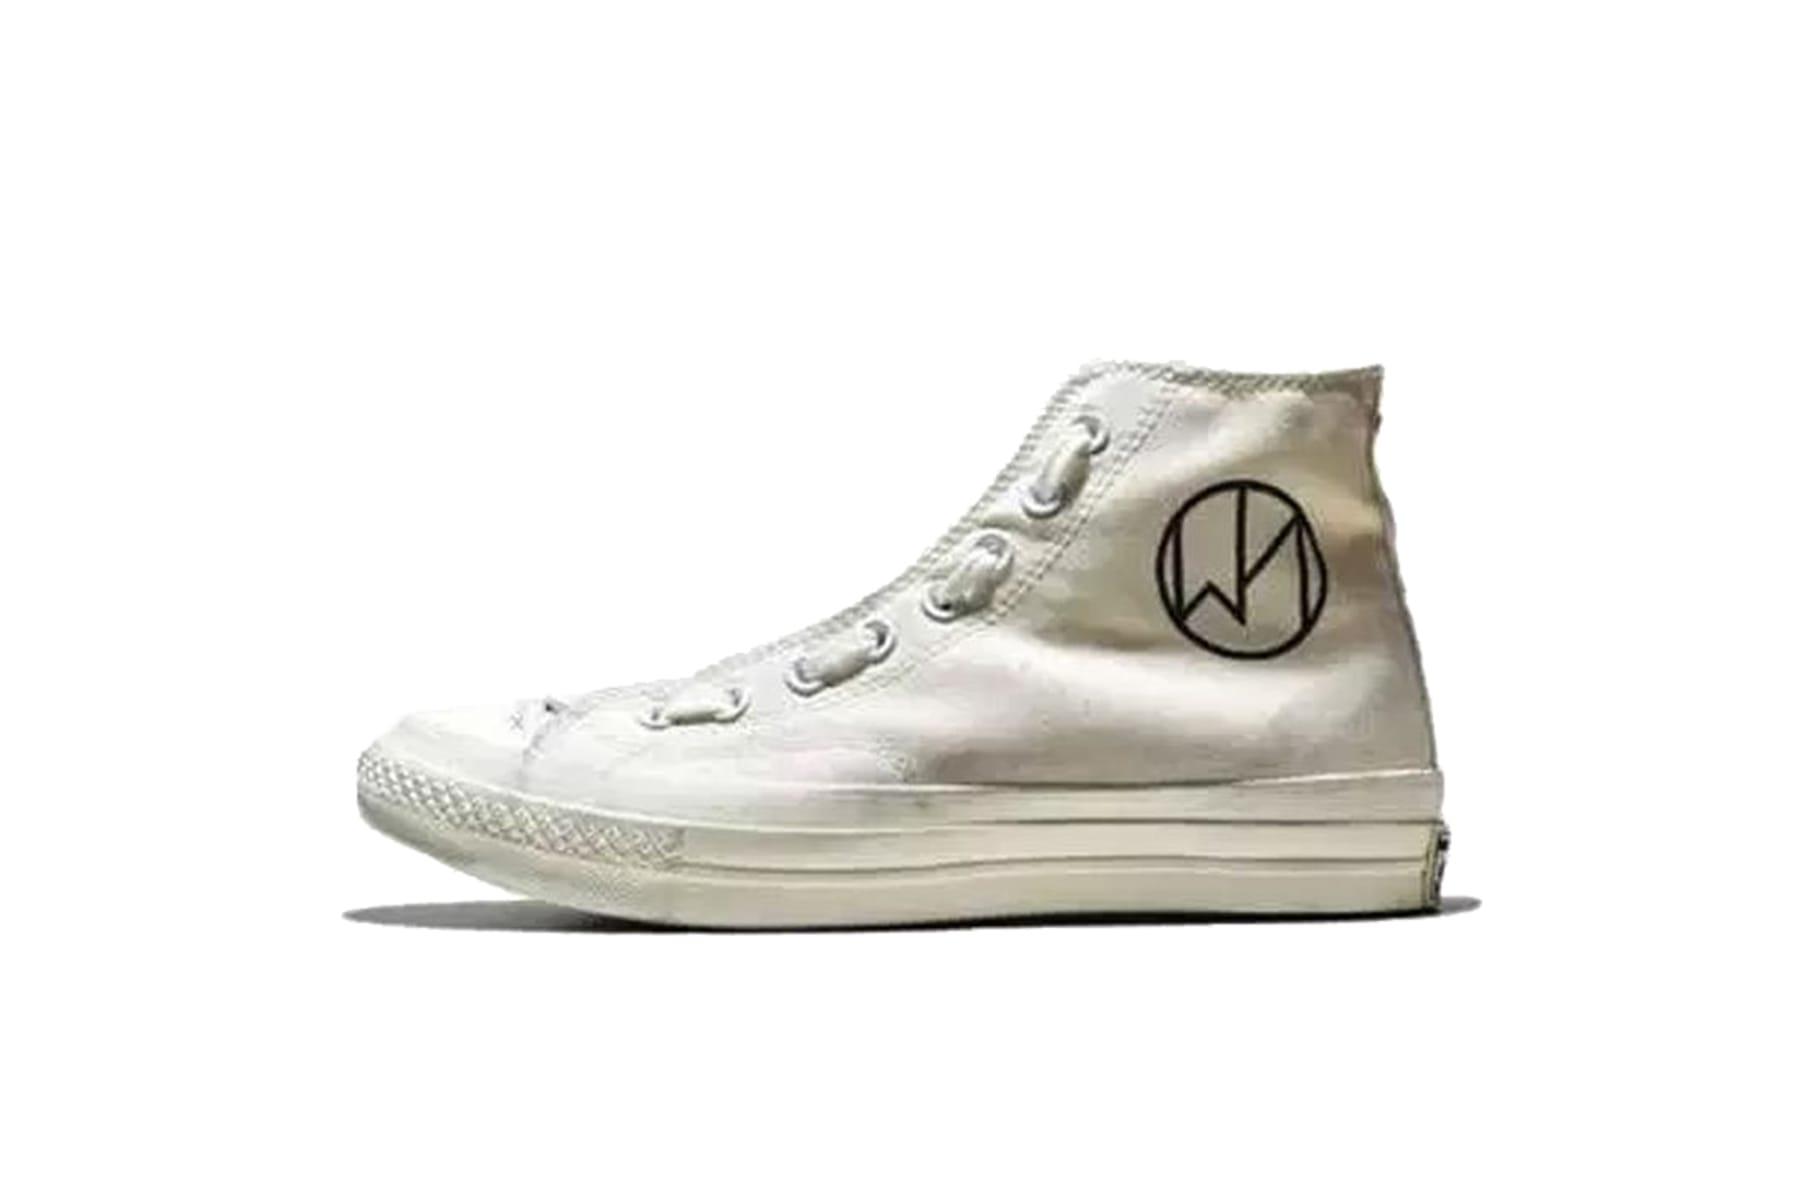 UNDERCOVER x Converse \